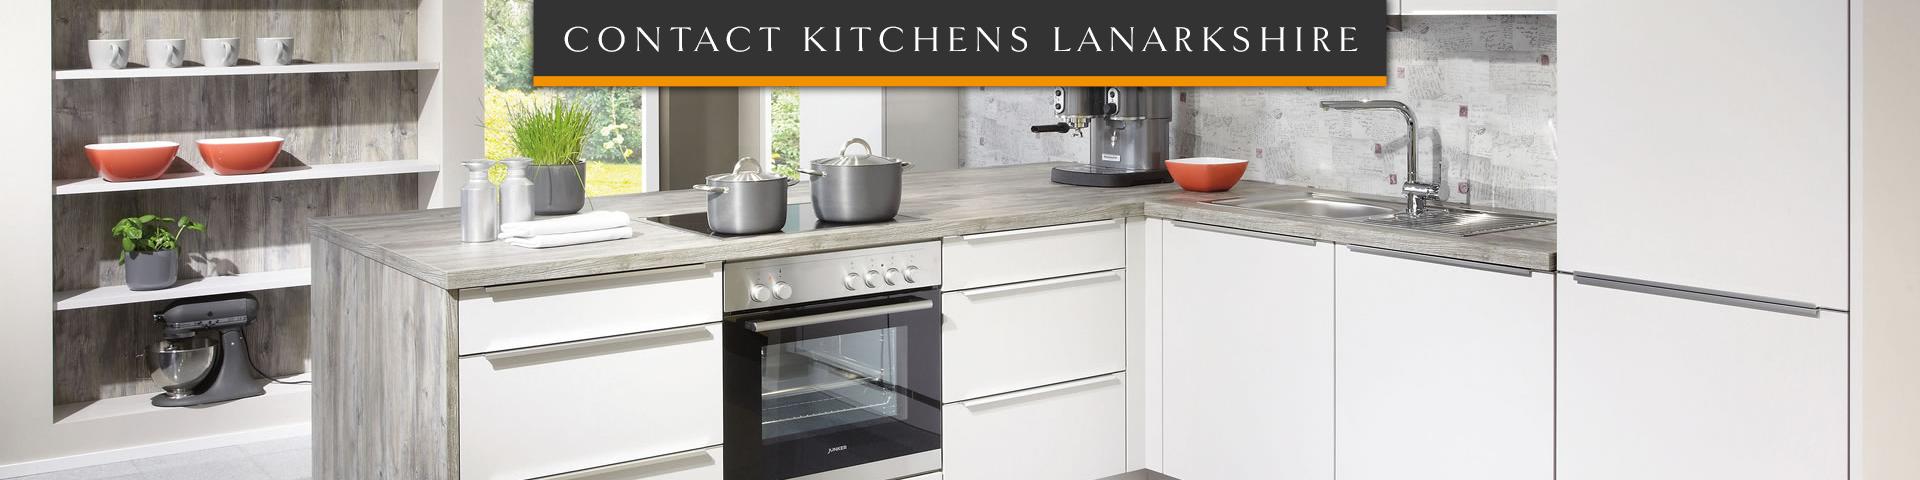 Contact Kitchens Lanarkshire